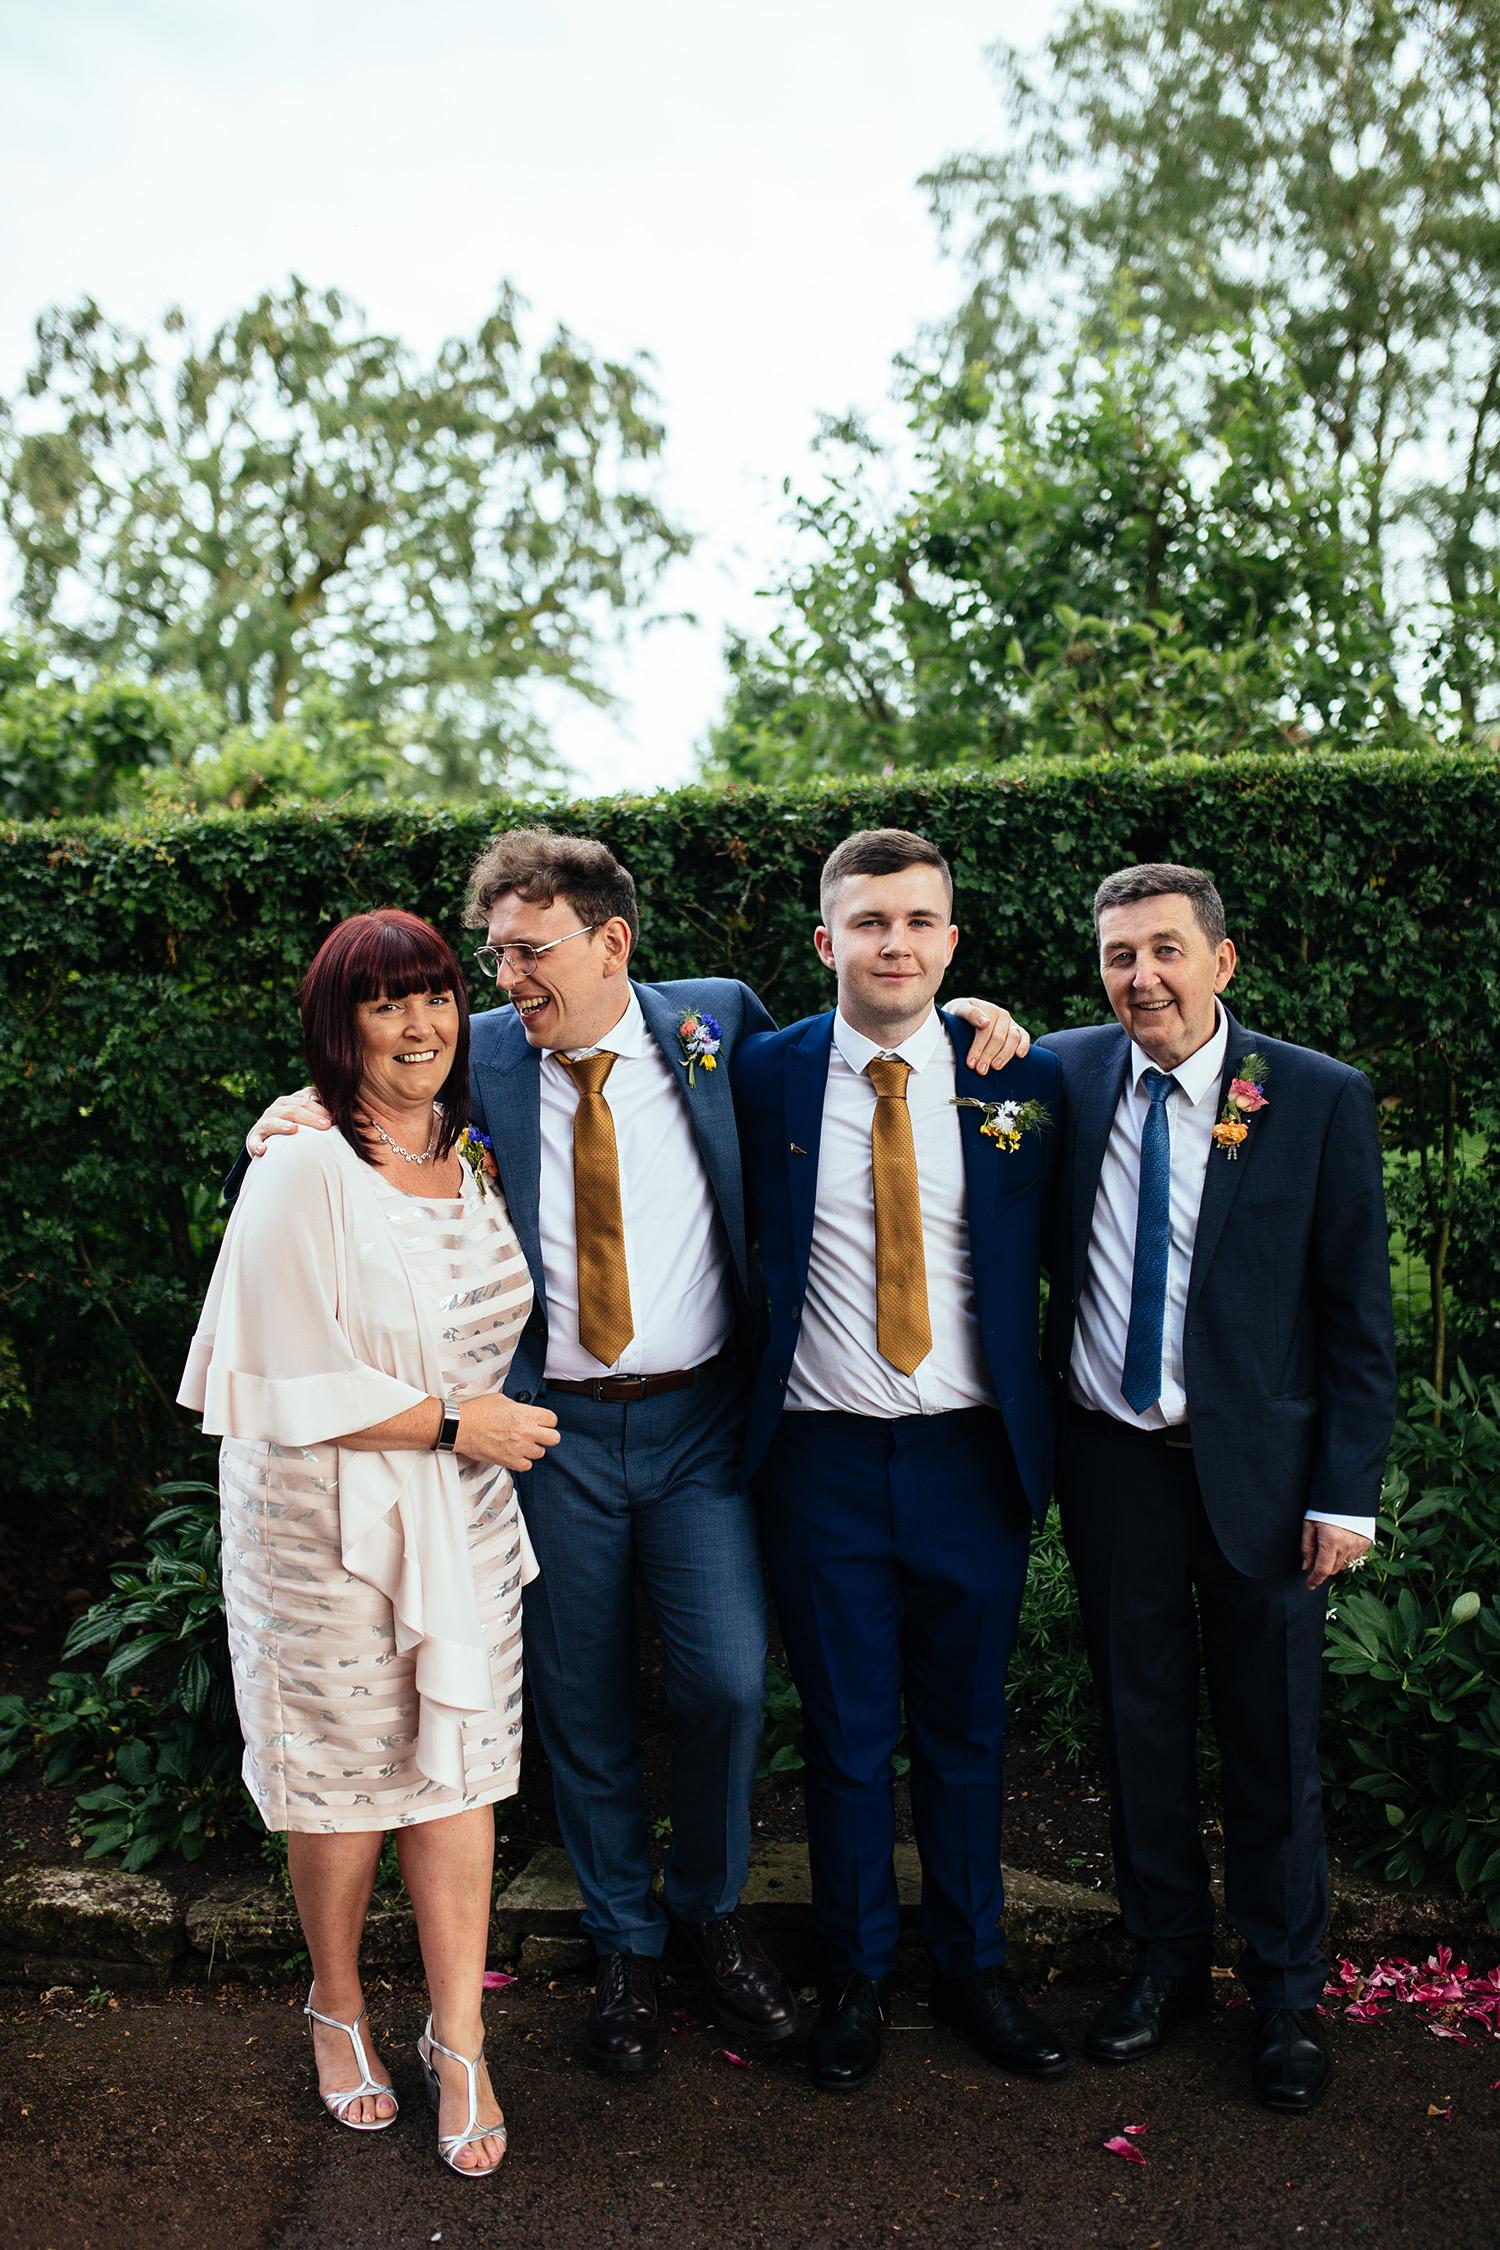 Manchester Wes Anderson Village Hall Wedding 139.jpg